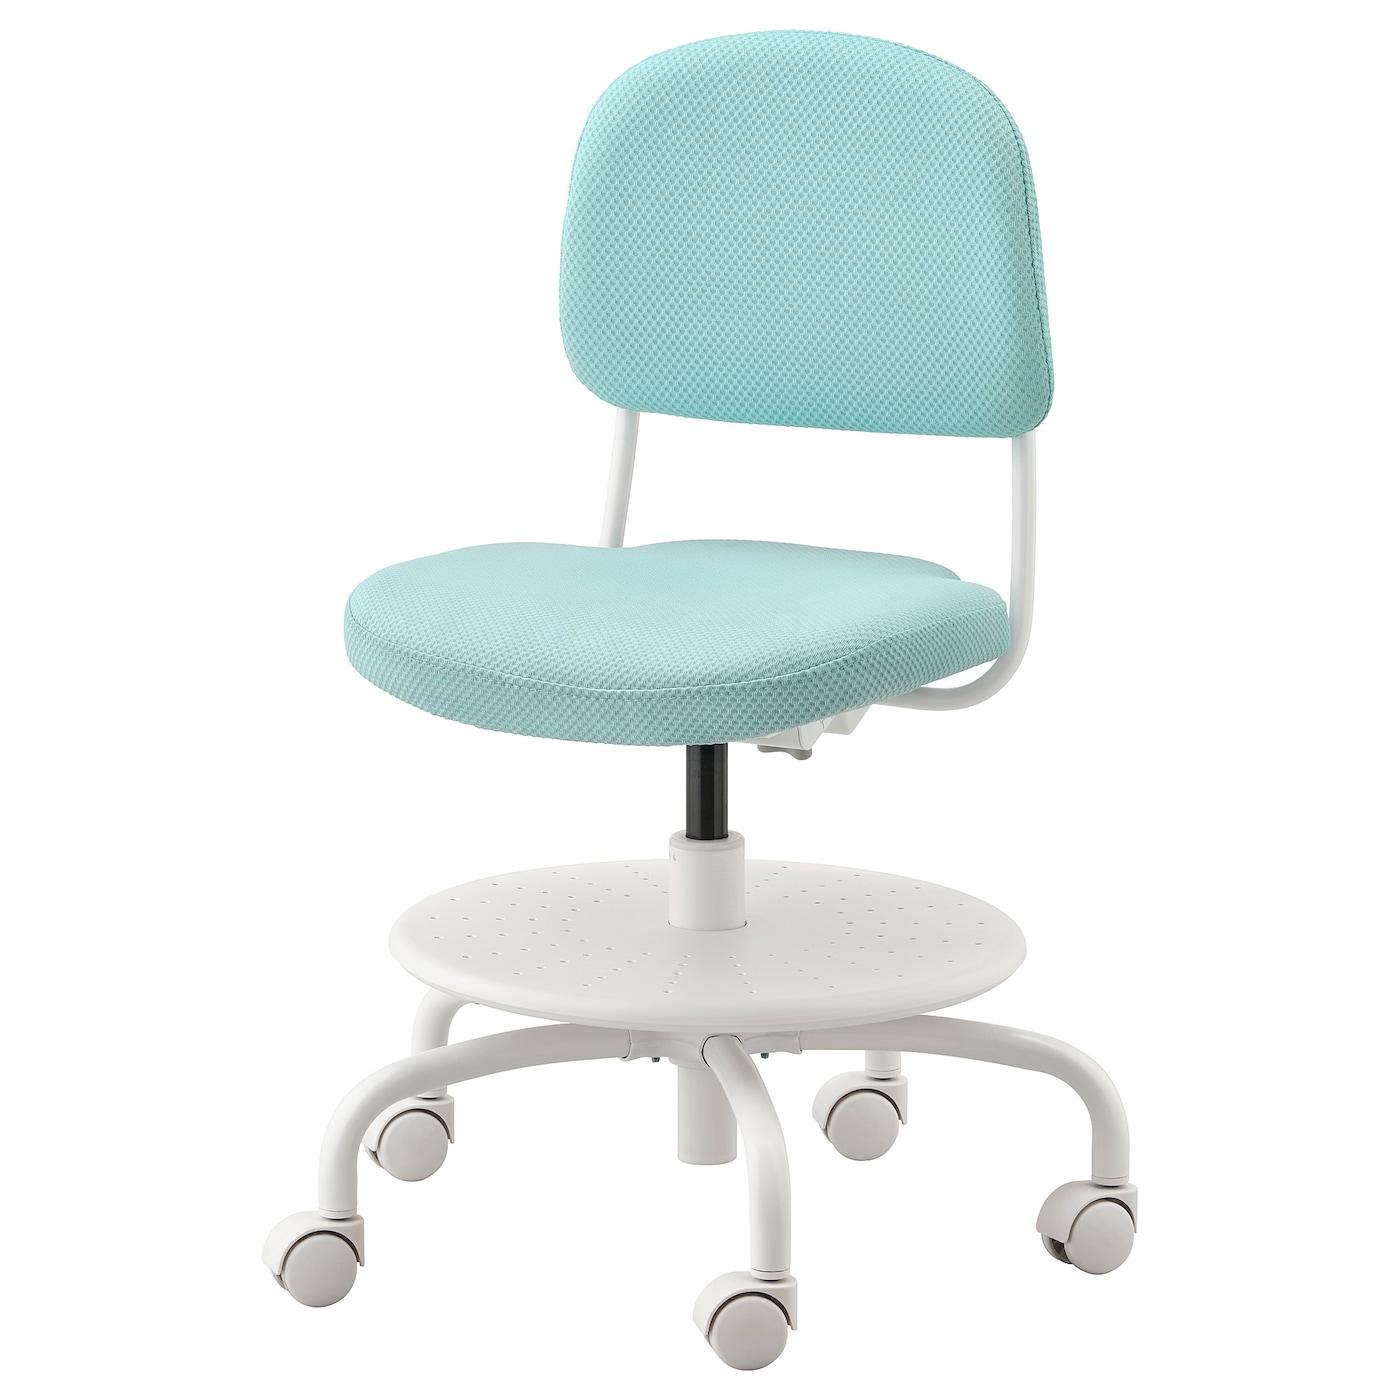 Image of: Vimund Child S Desk Chair Light Turquoise Ikea